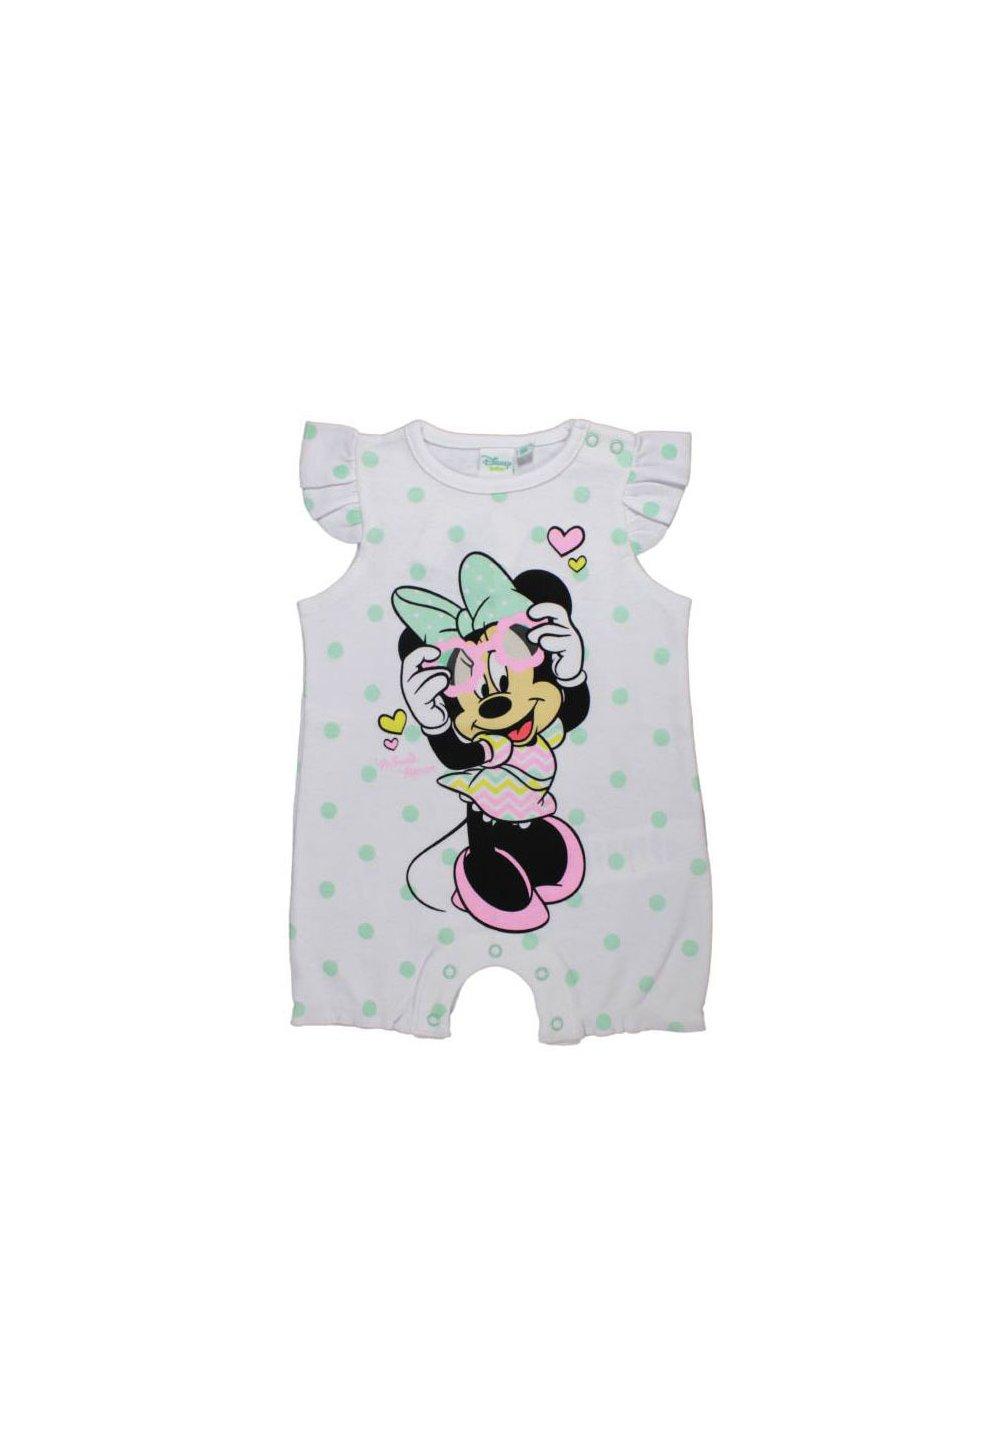 Salopeta vara, Minnie Mouse, alba cu buline verzi imagine